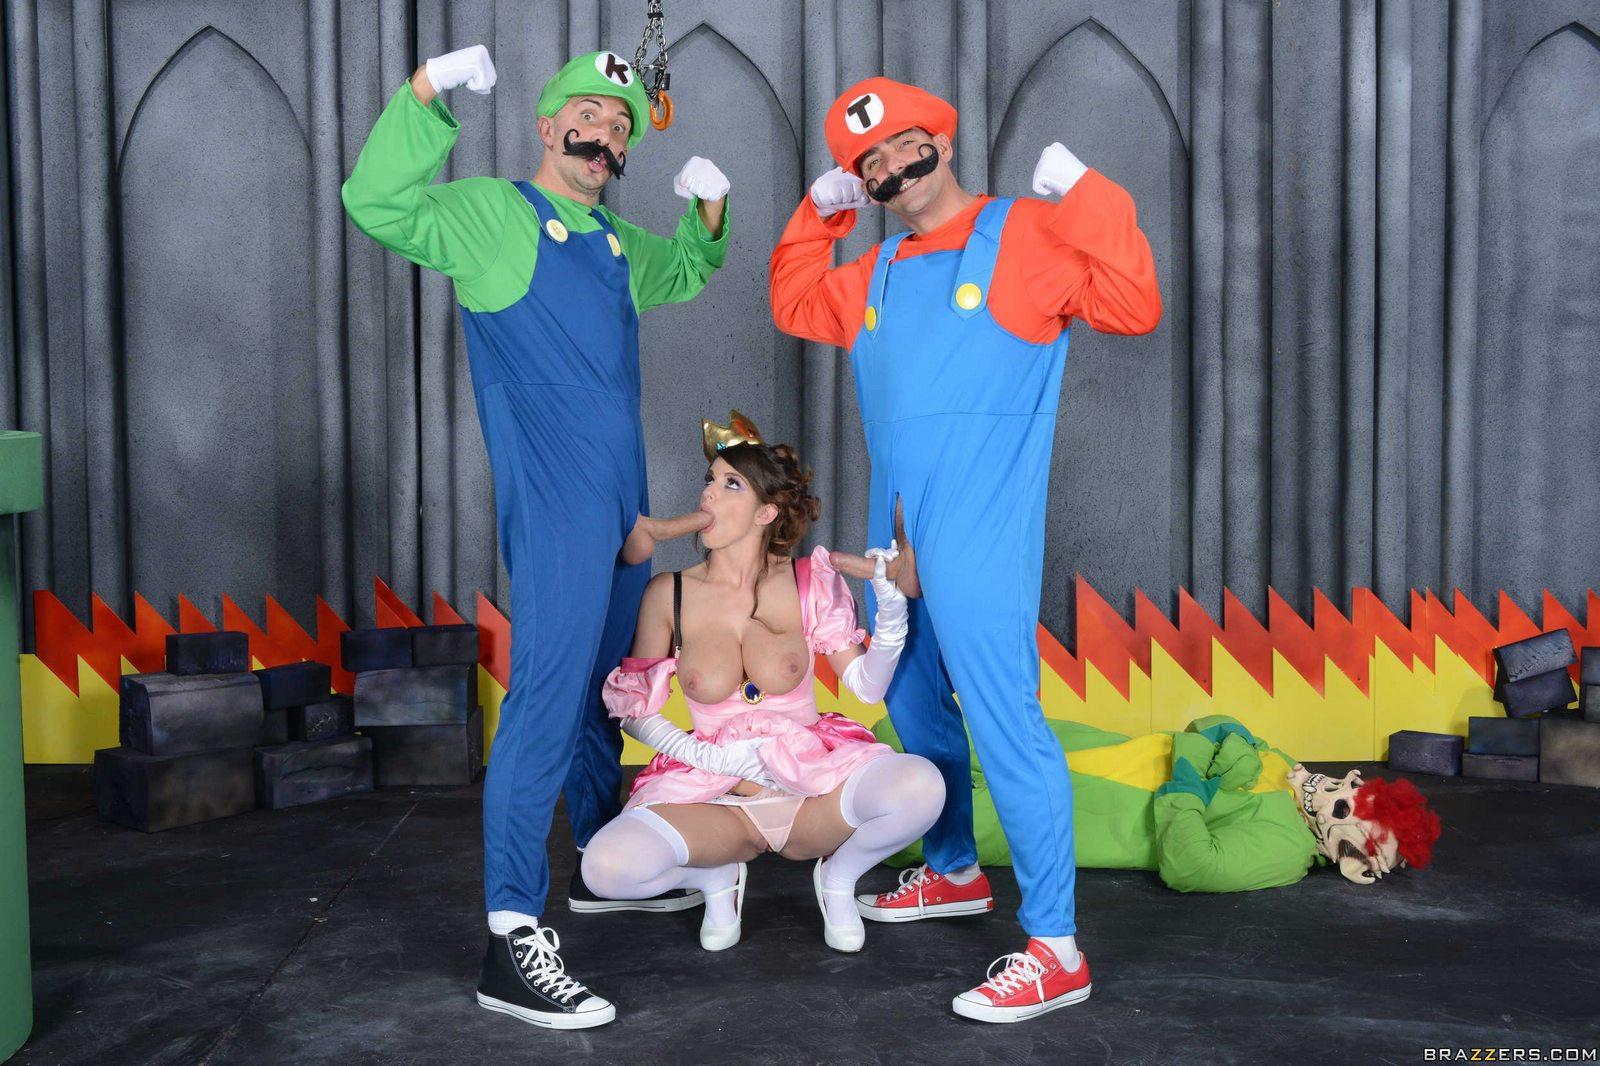 mypornstarbook net pornstars b brooklyn chase gallery03 04